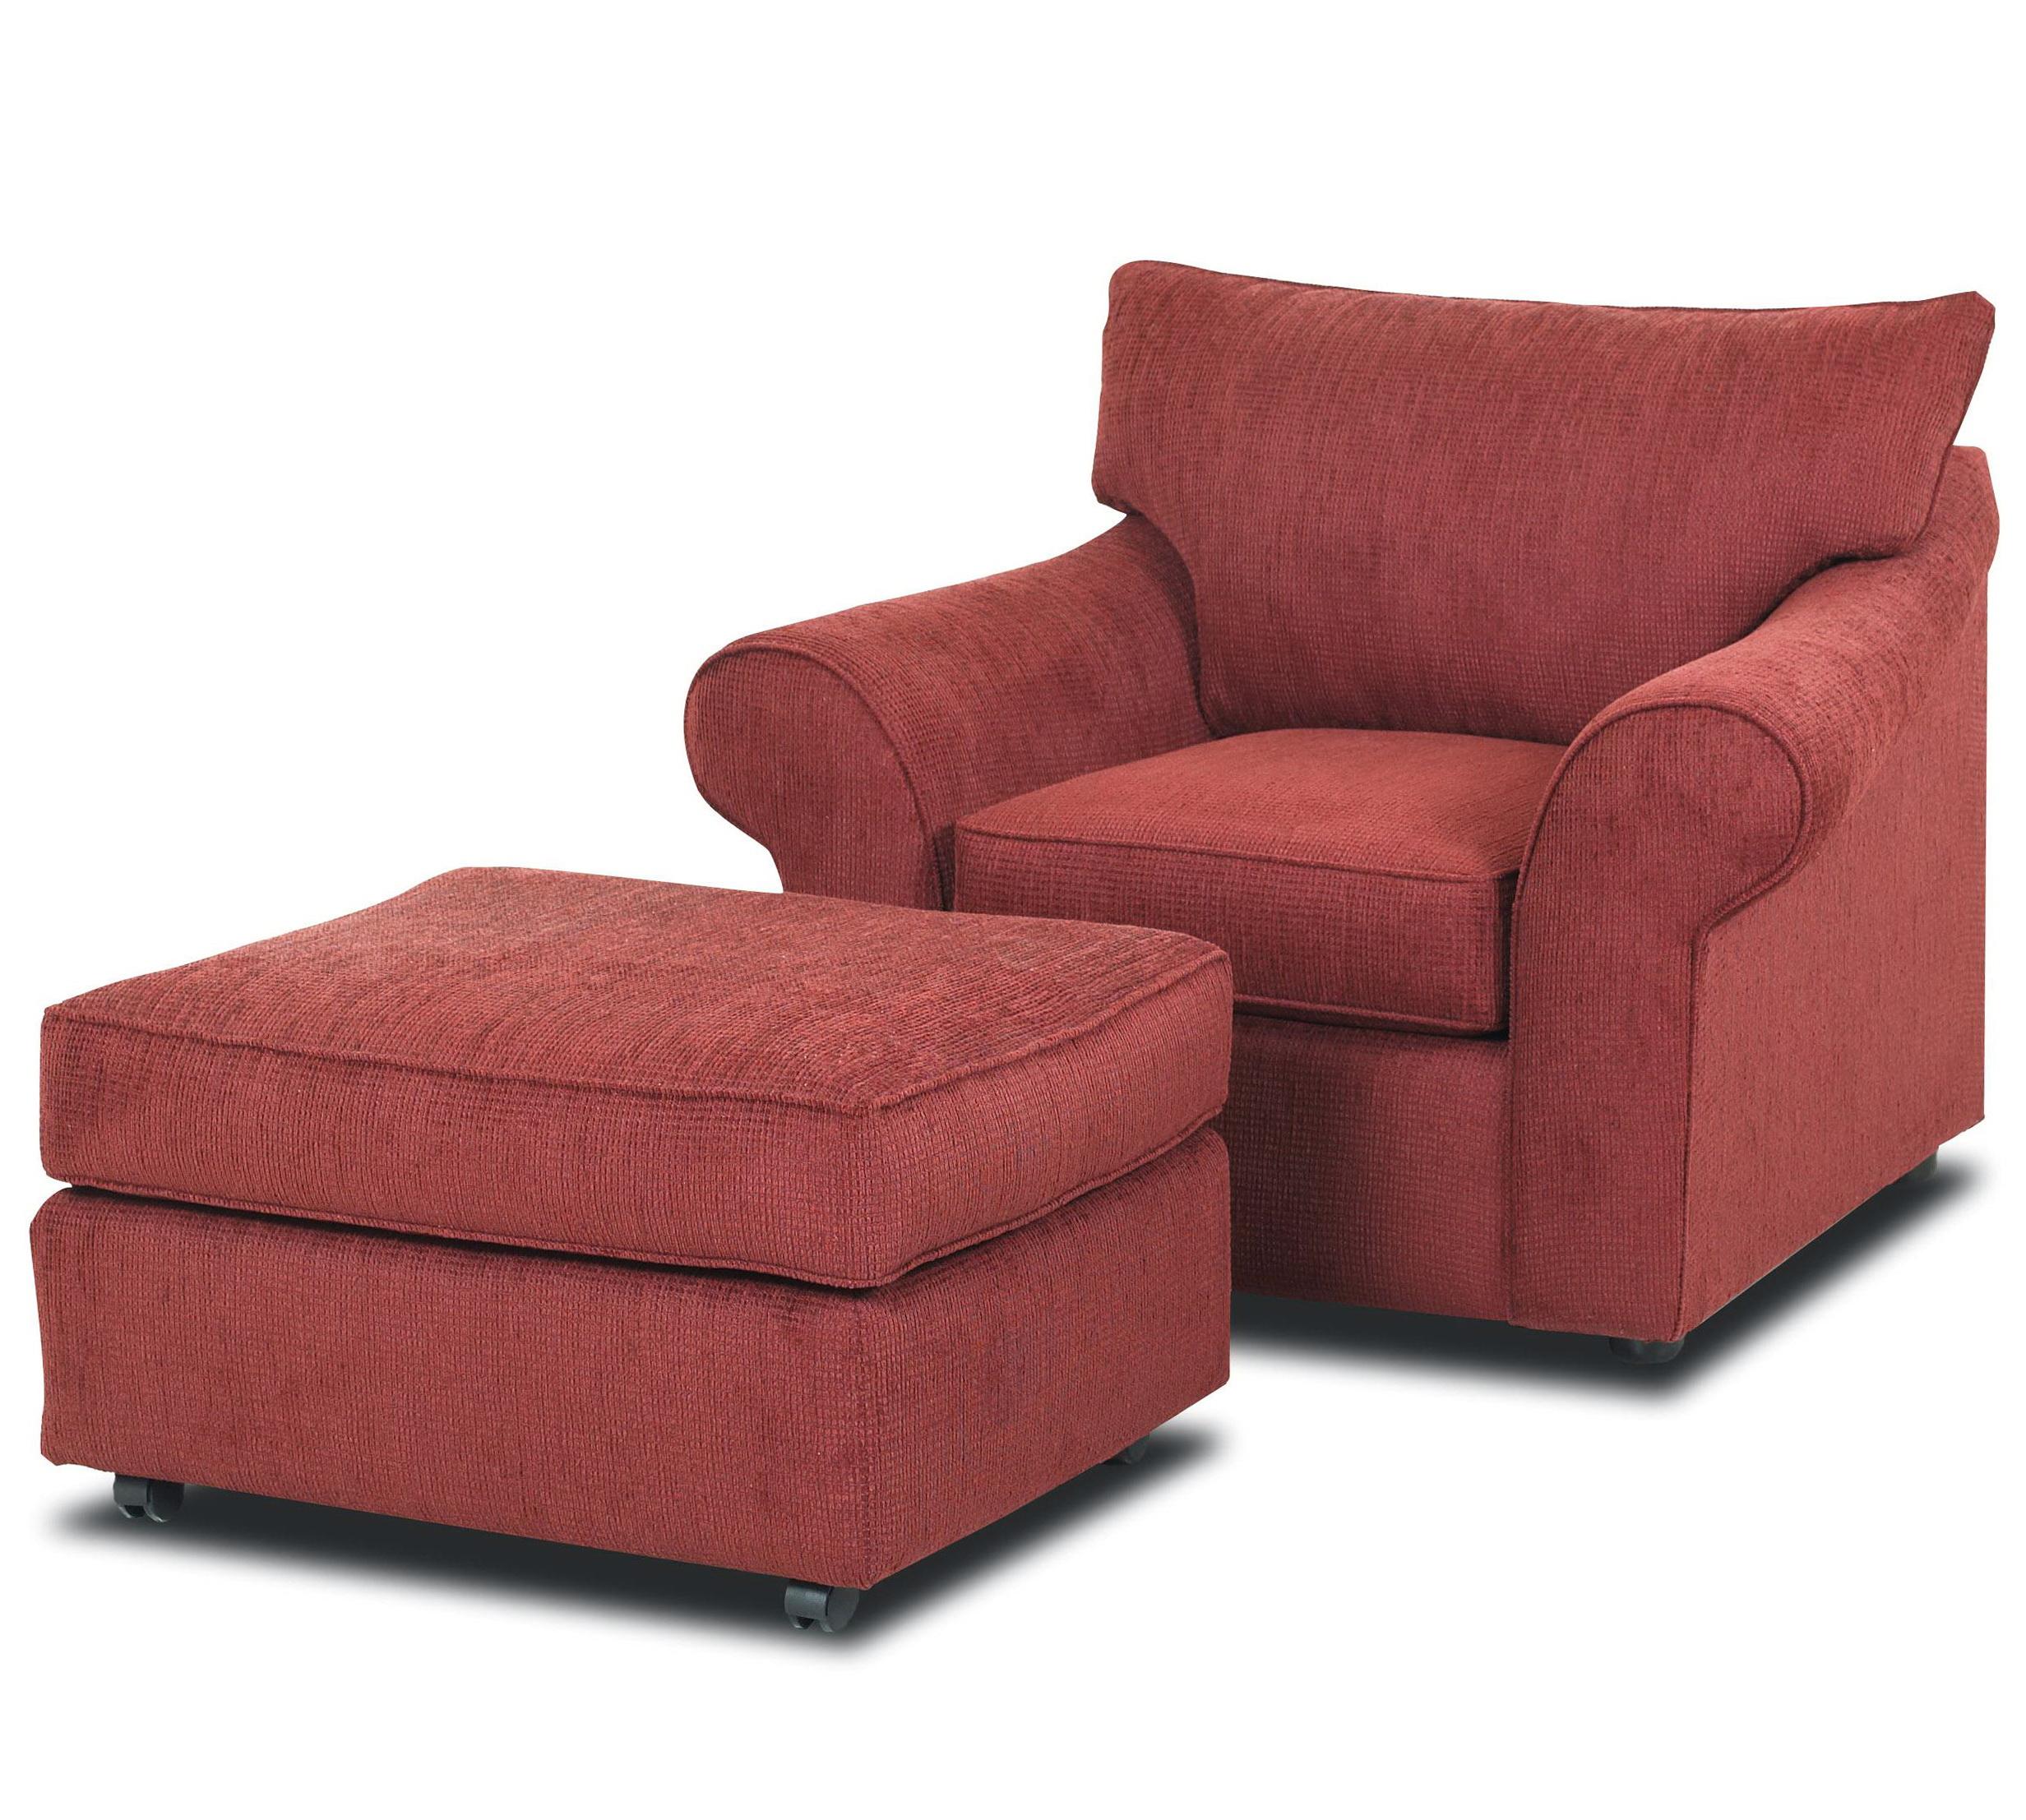 Chair And Ottoman Sets Cheap Home Design Ideas